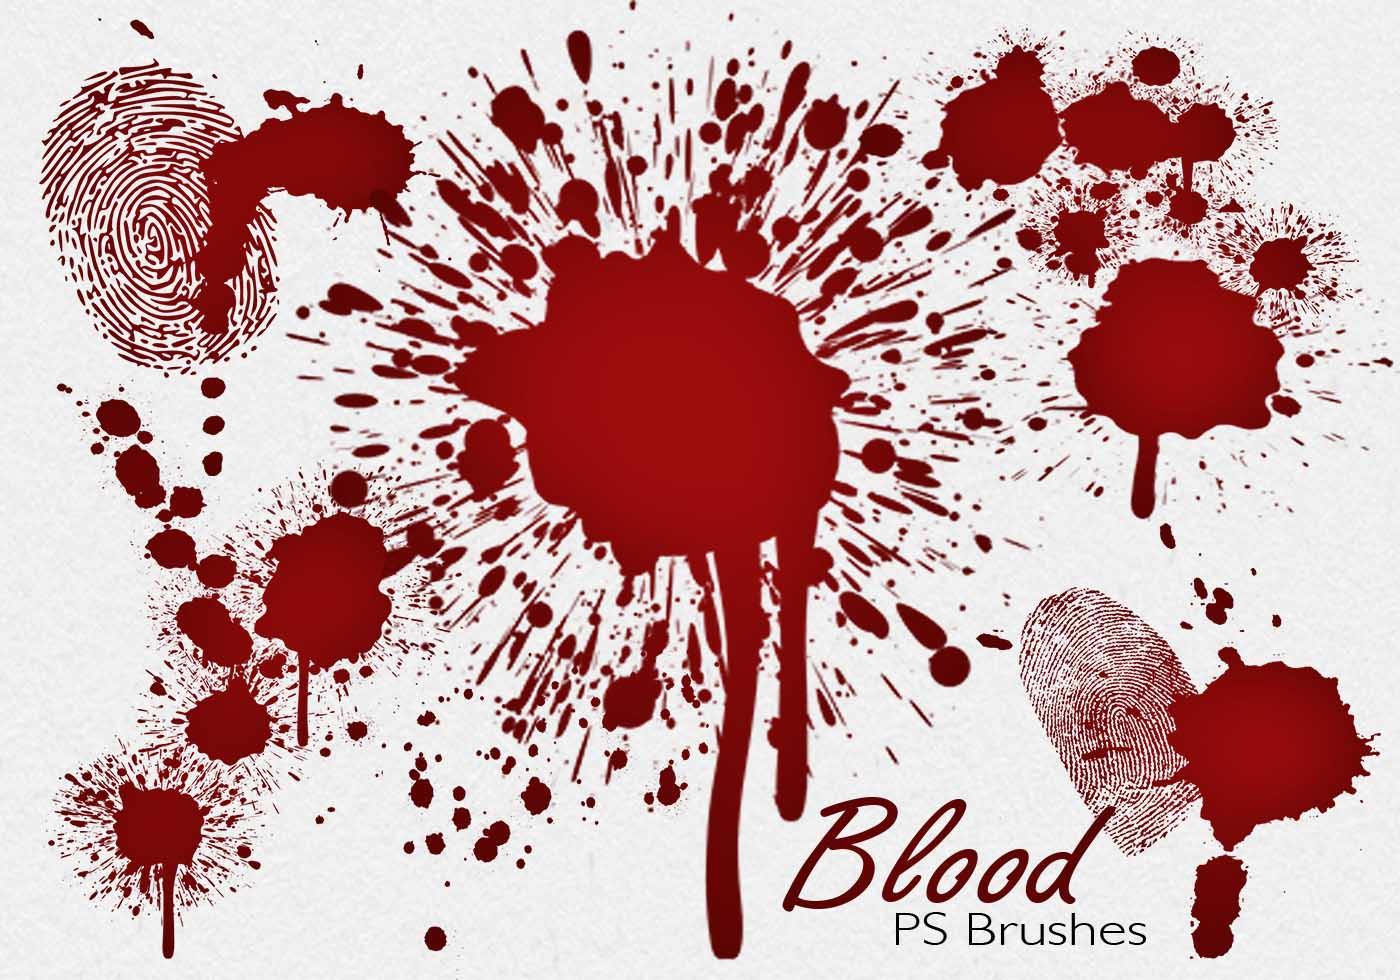 20 Blood Splatter Ps Brushes Abr Vol 7